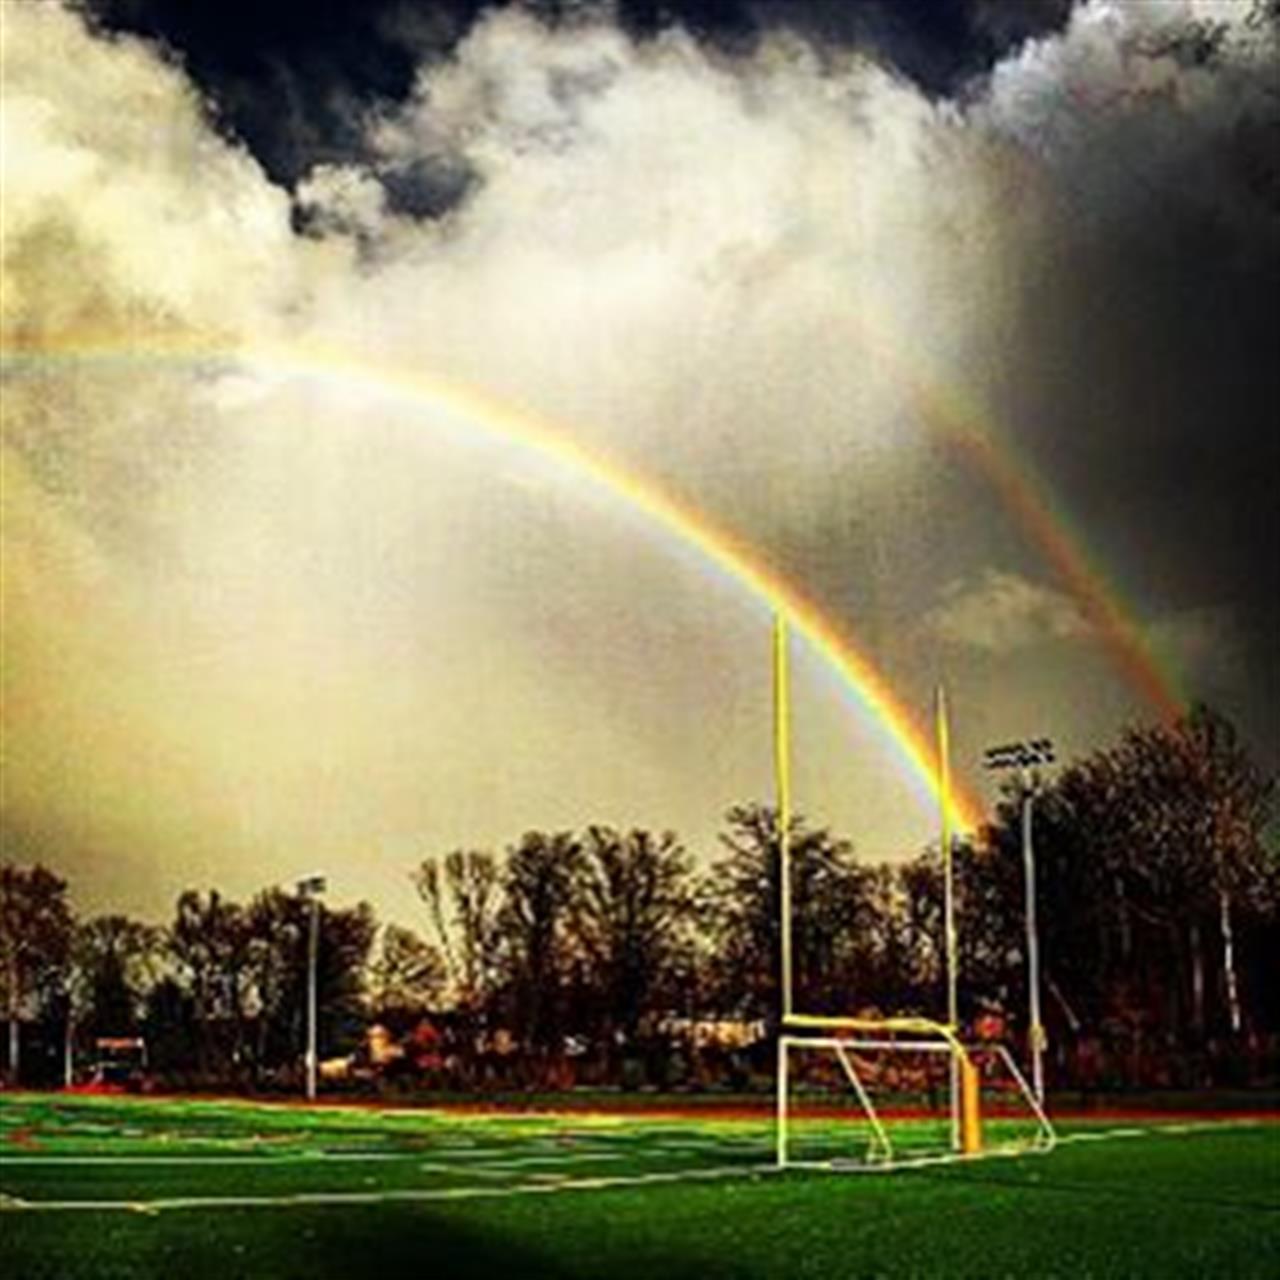 It's up.....it's good!!??#rainbow #nfl#playoffmagic #luckycharms #leadingrelocal #exploreyourhood #halstead #halsteadproperty #footballsunday #sunday #sundayfunday